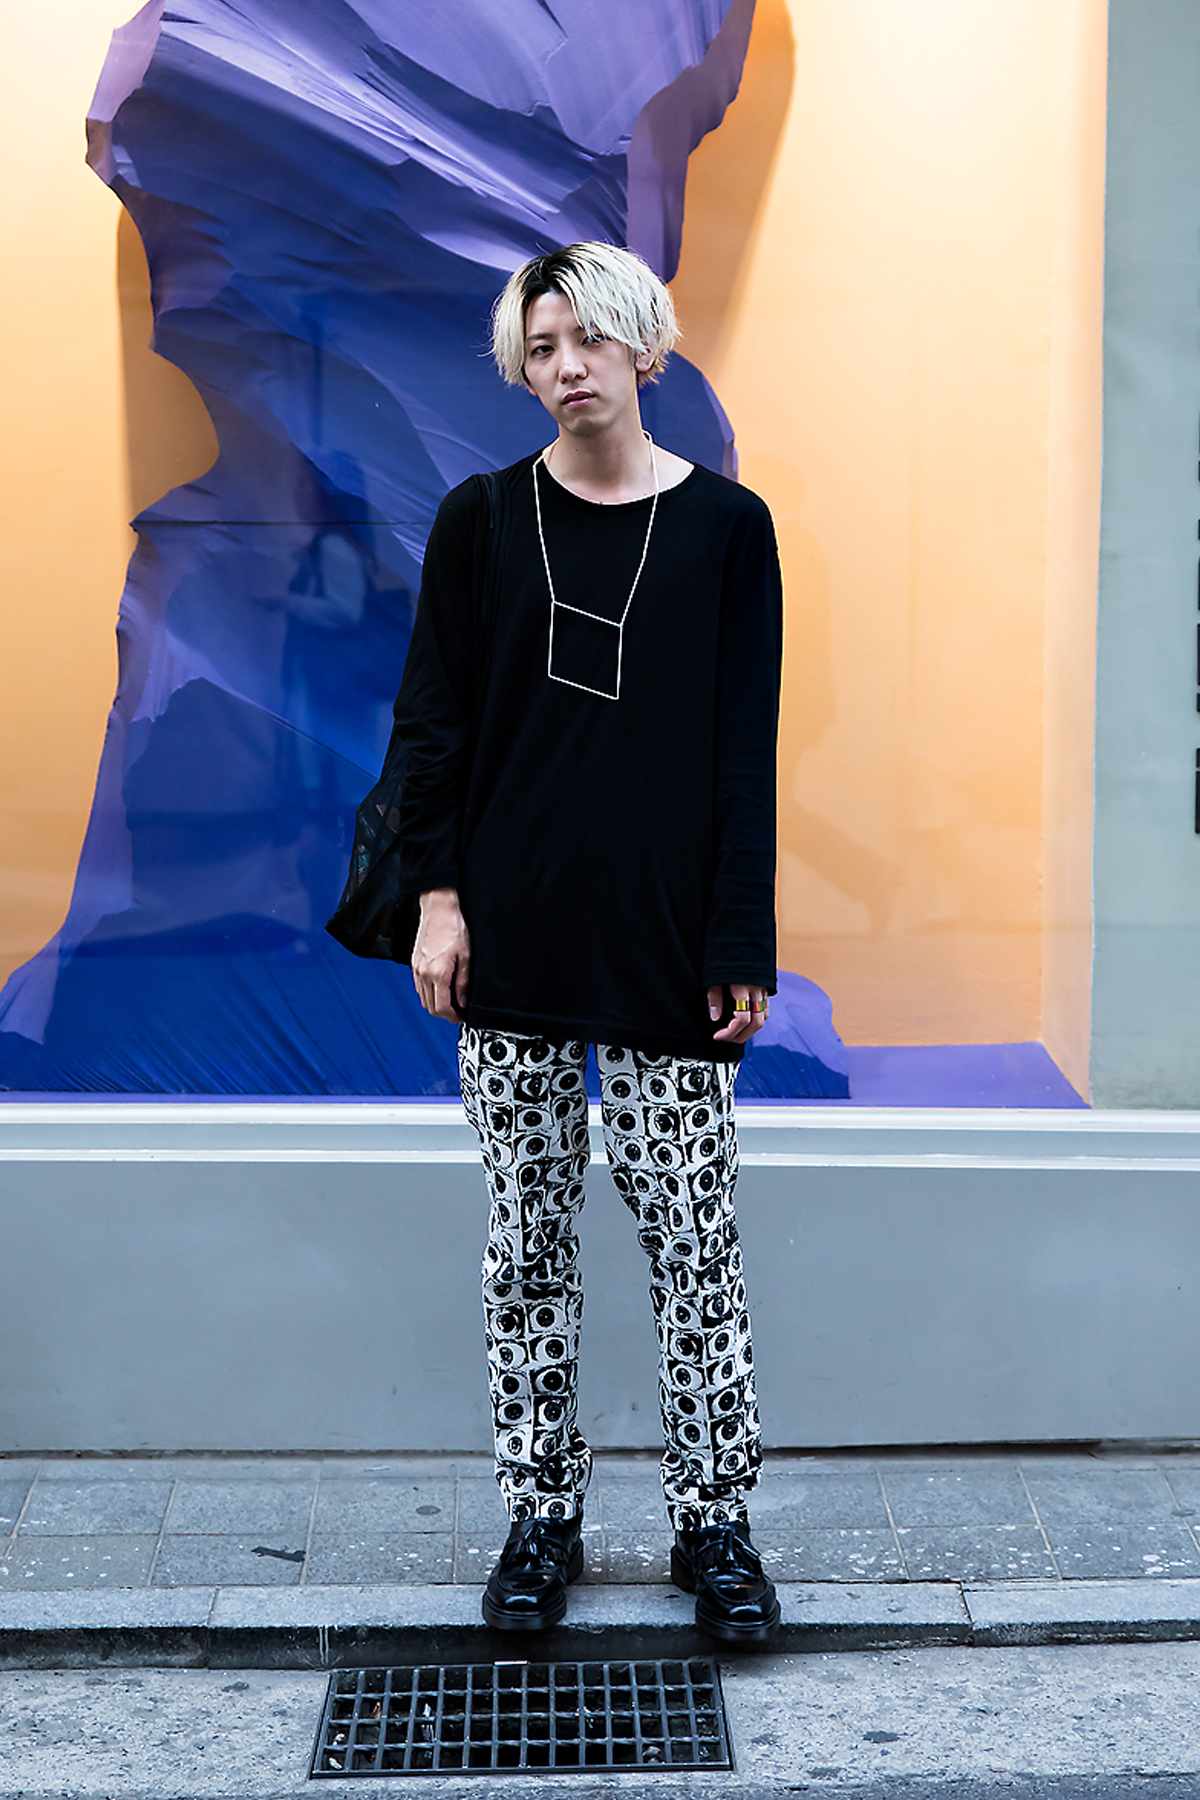 Kyohei, Street Fashion 2017 in Seoul.jpg